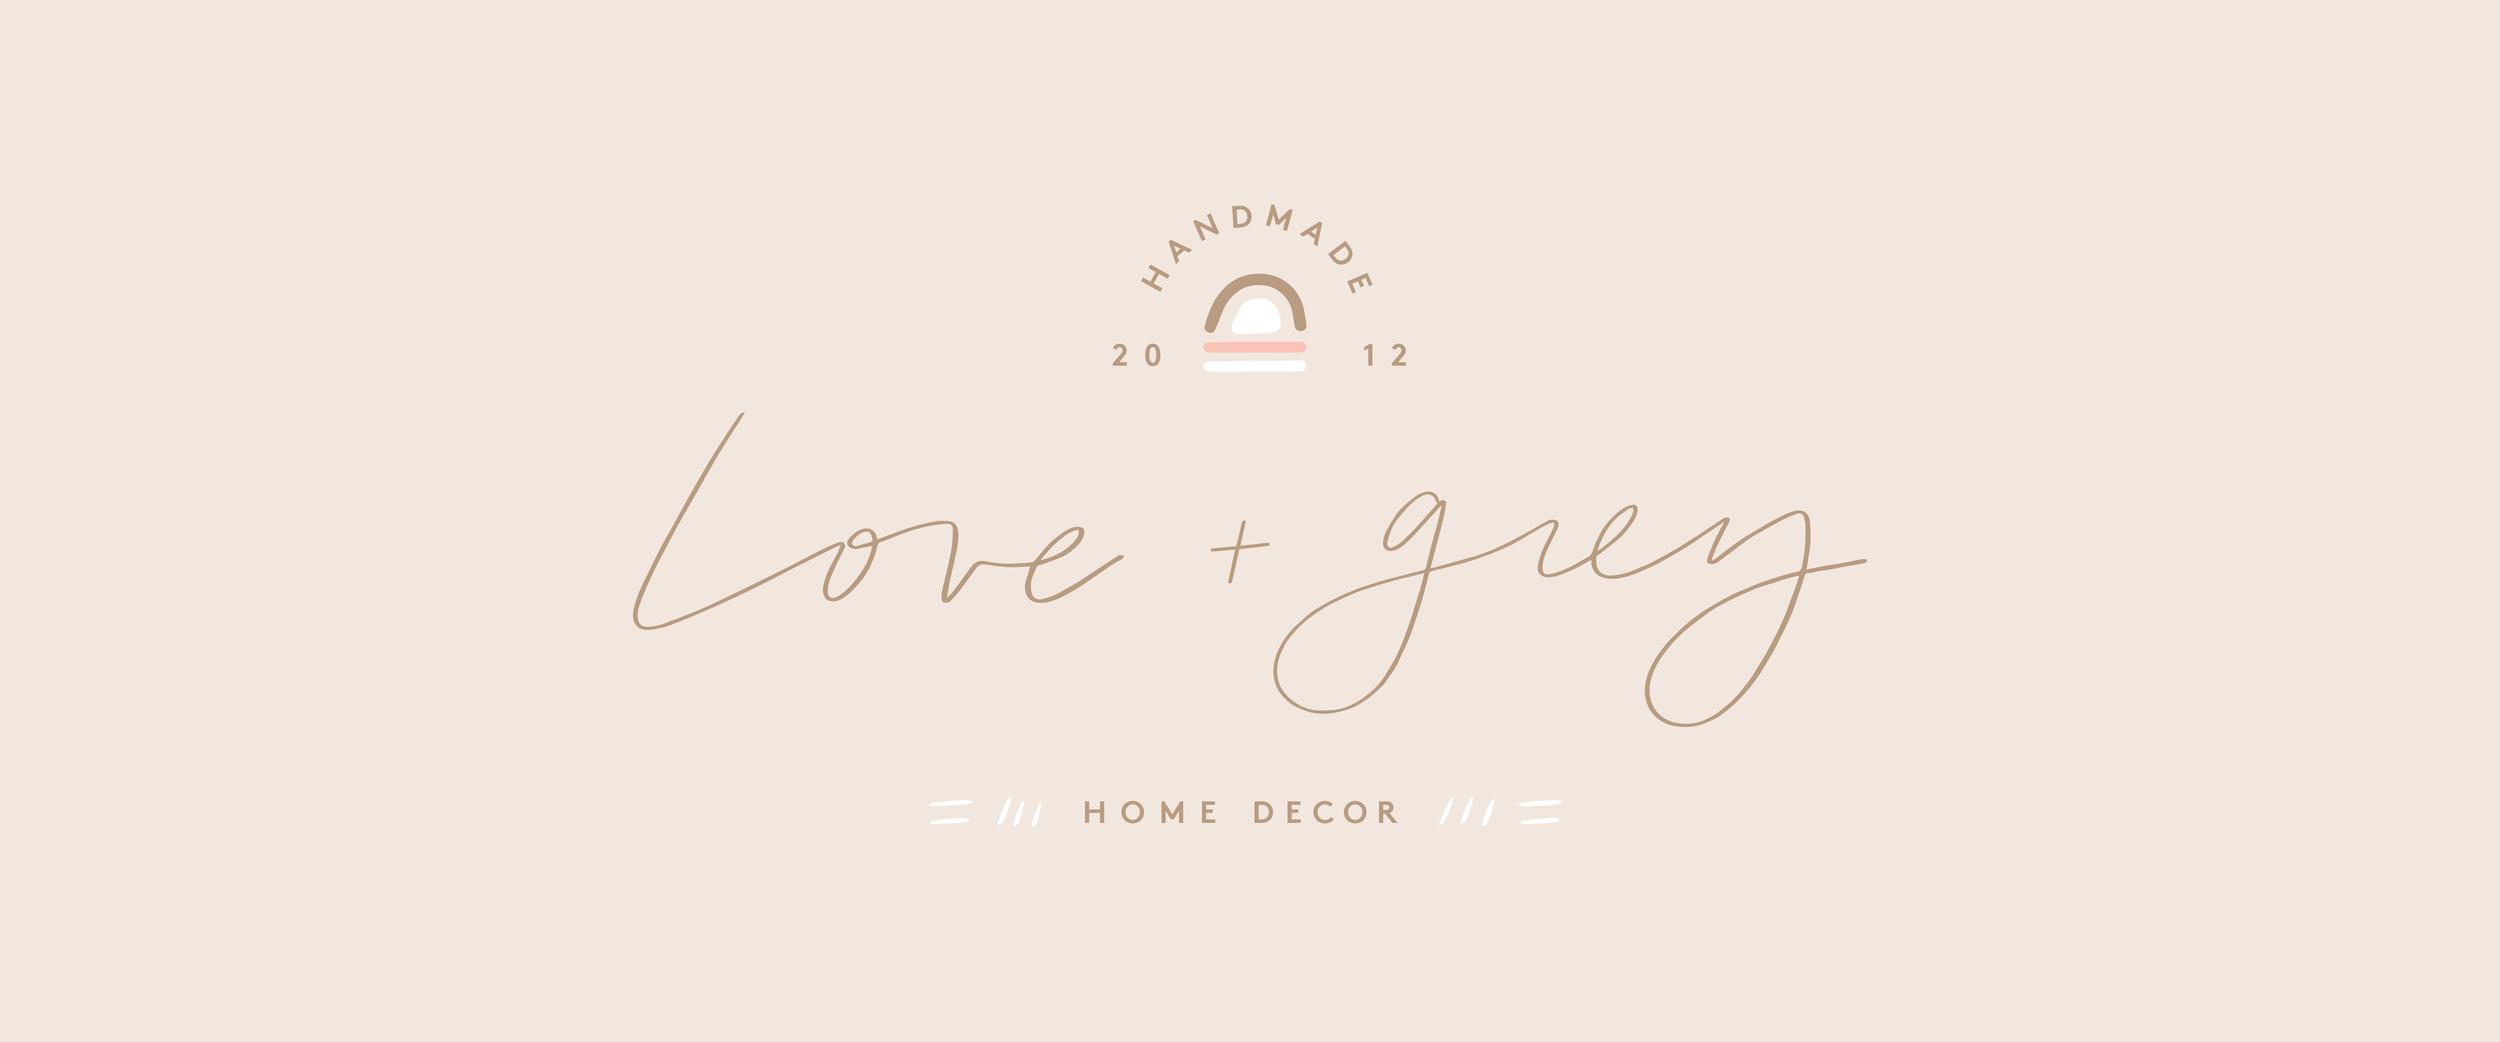 love-grey-etsy-wholesale-signs-branding-beachy-boho7.png